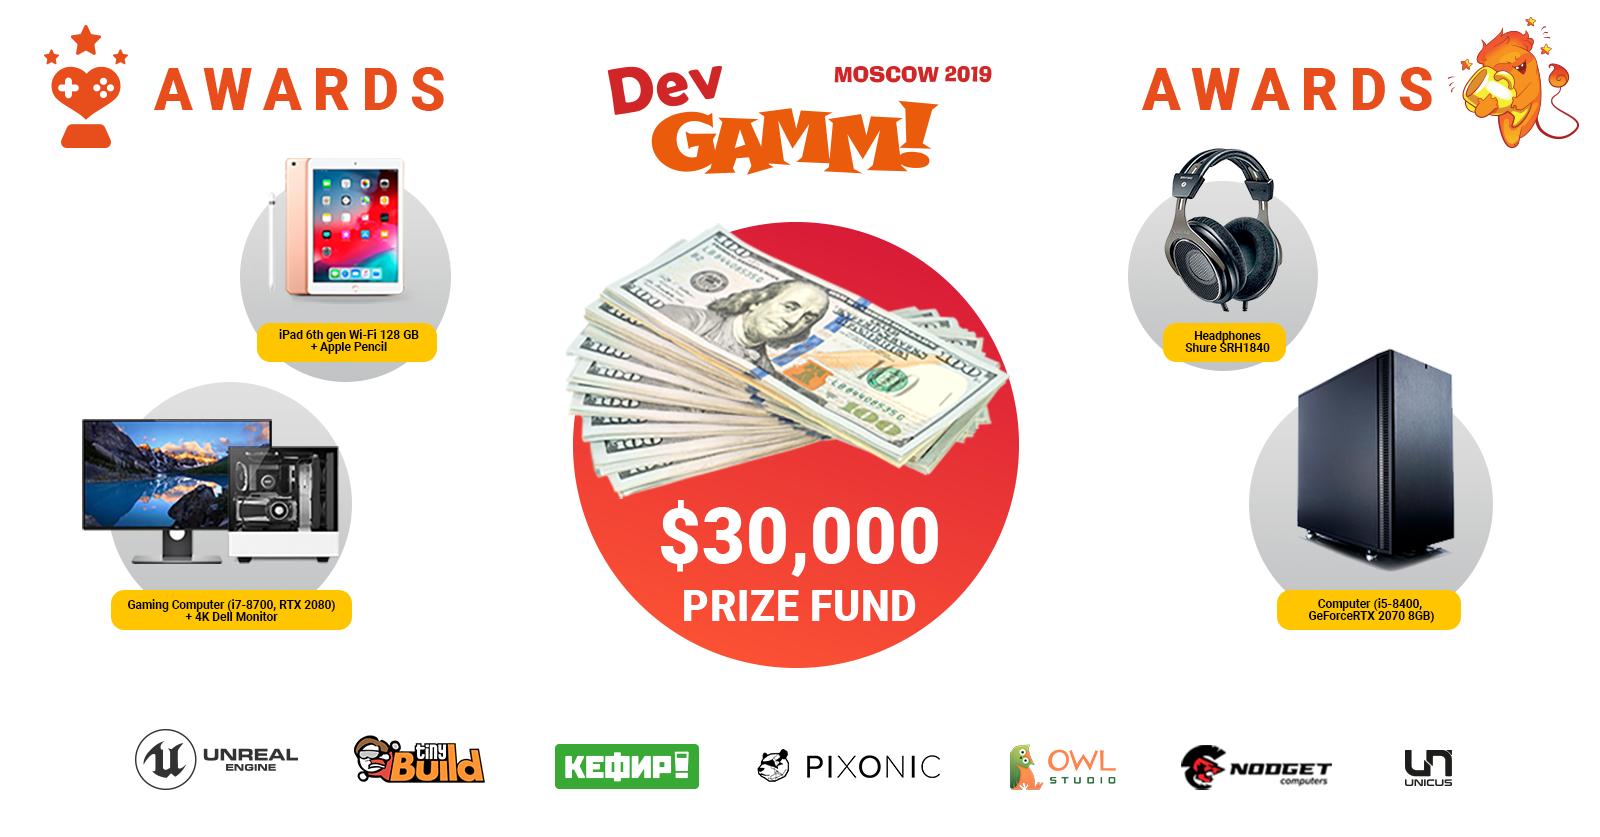 DevGAMM Awards nominees announced